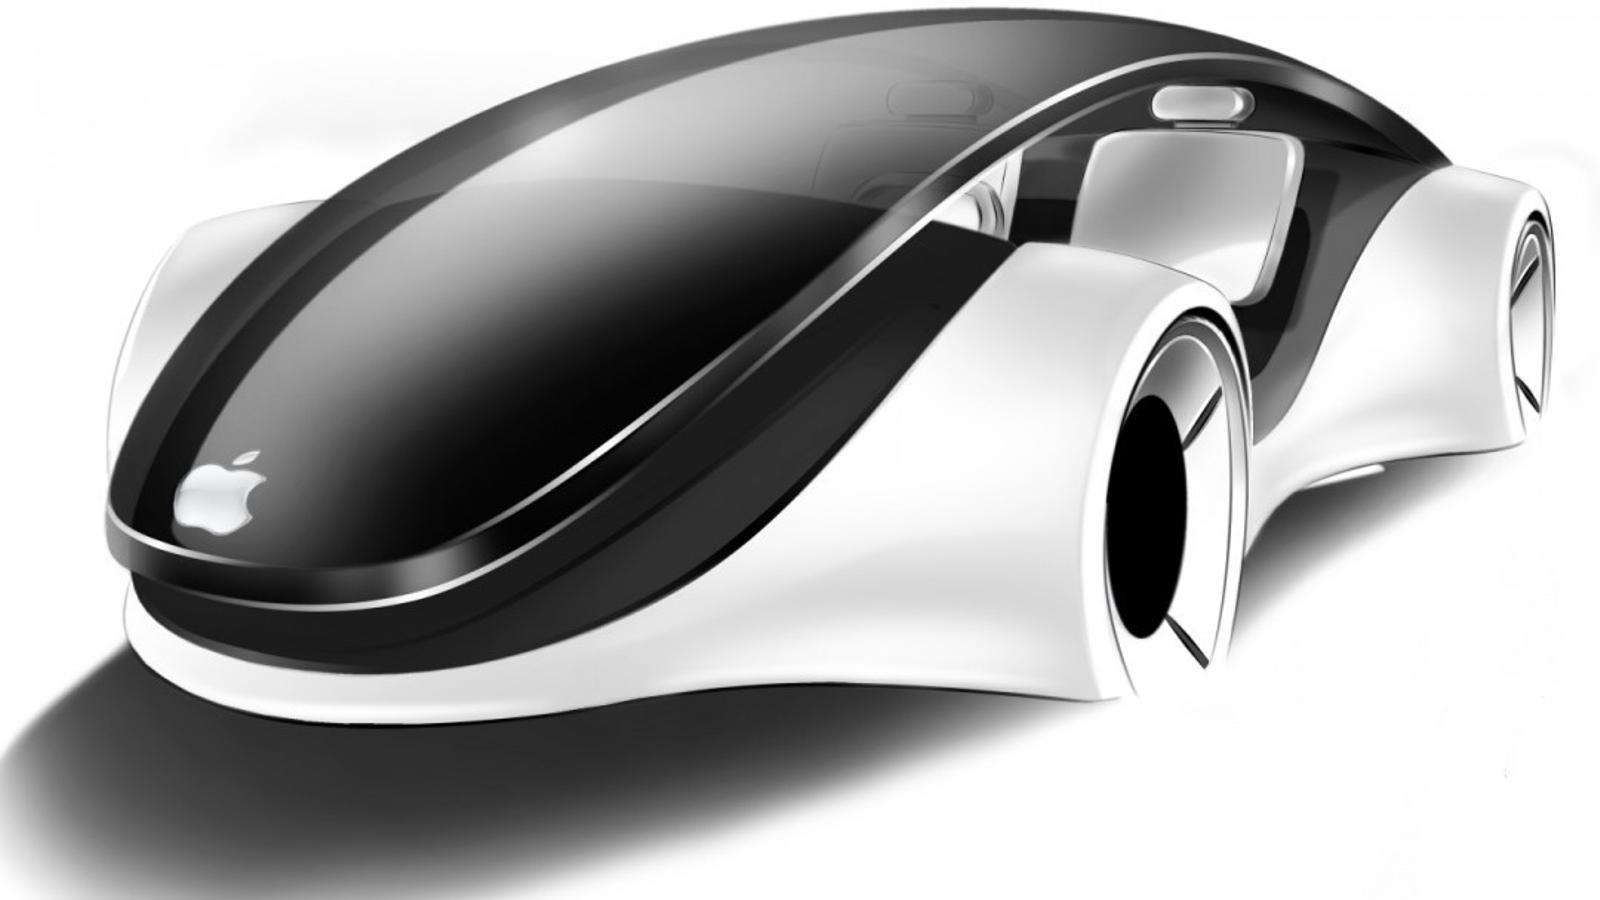 Apple abandona el cotxe autònom